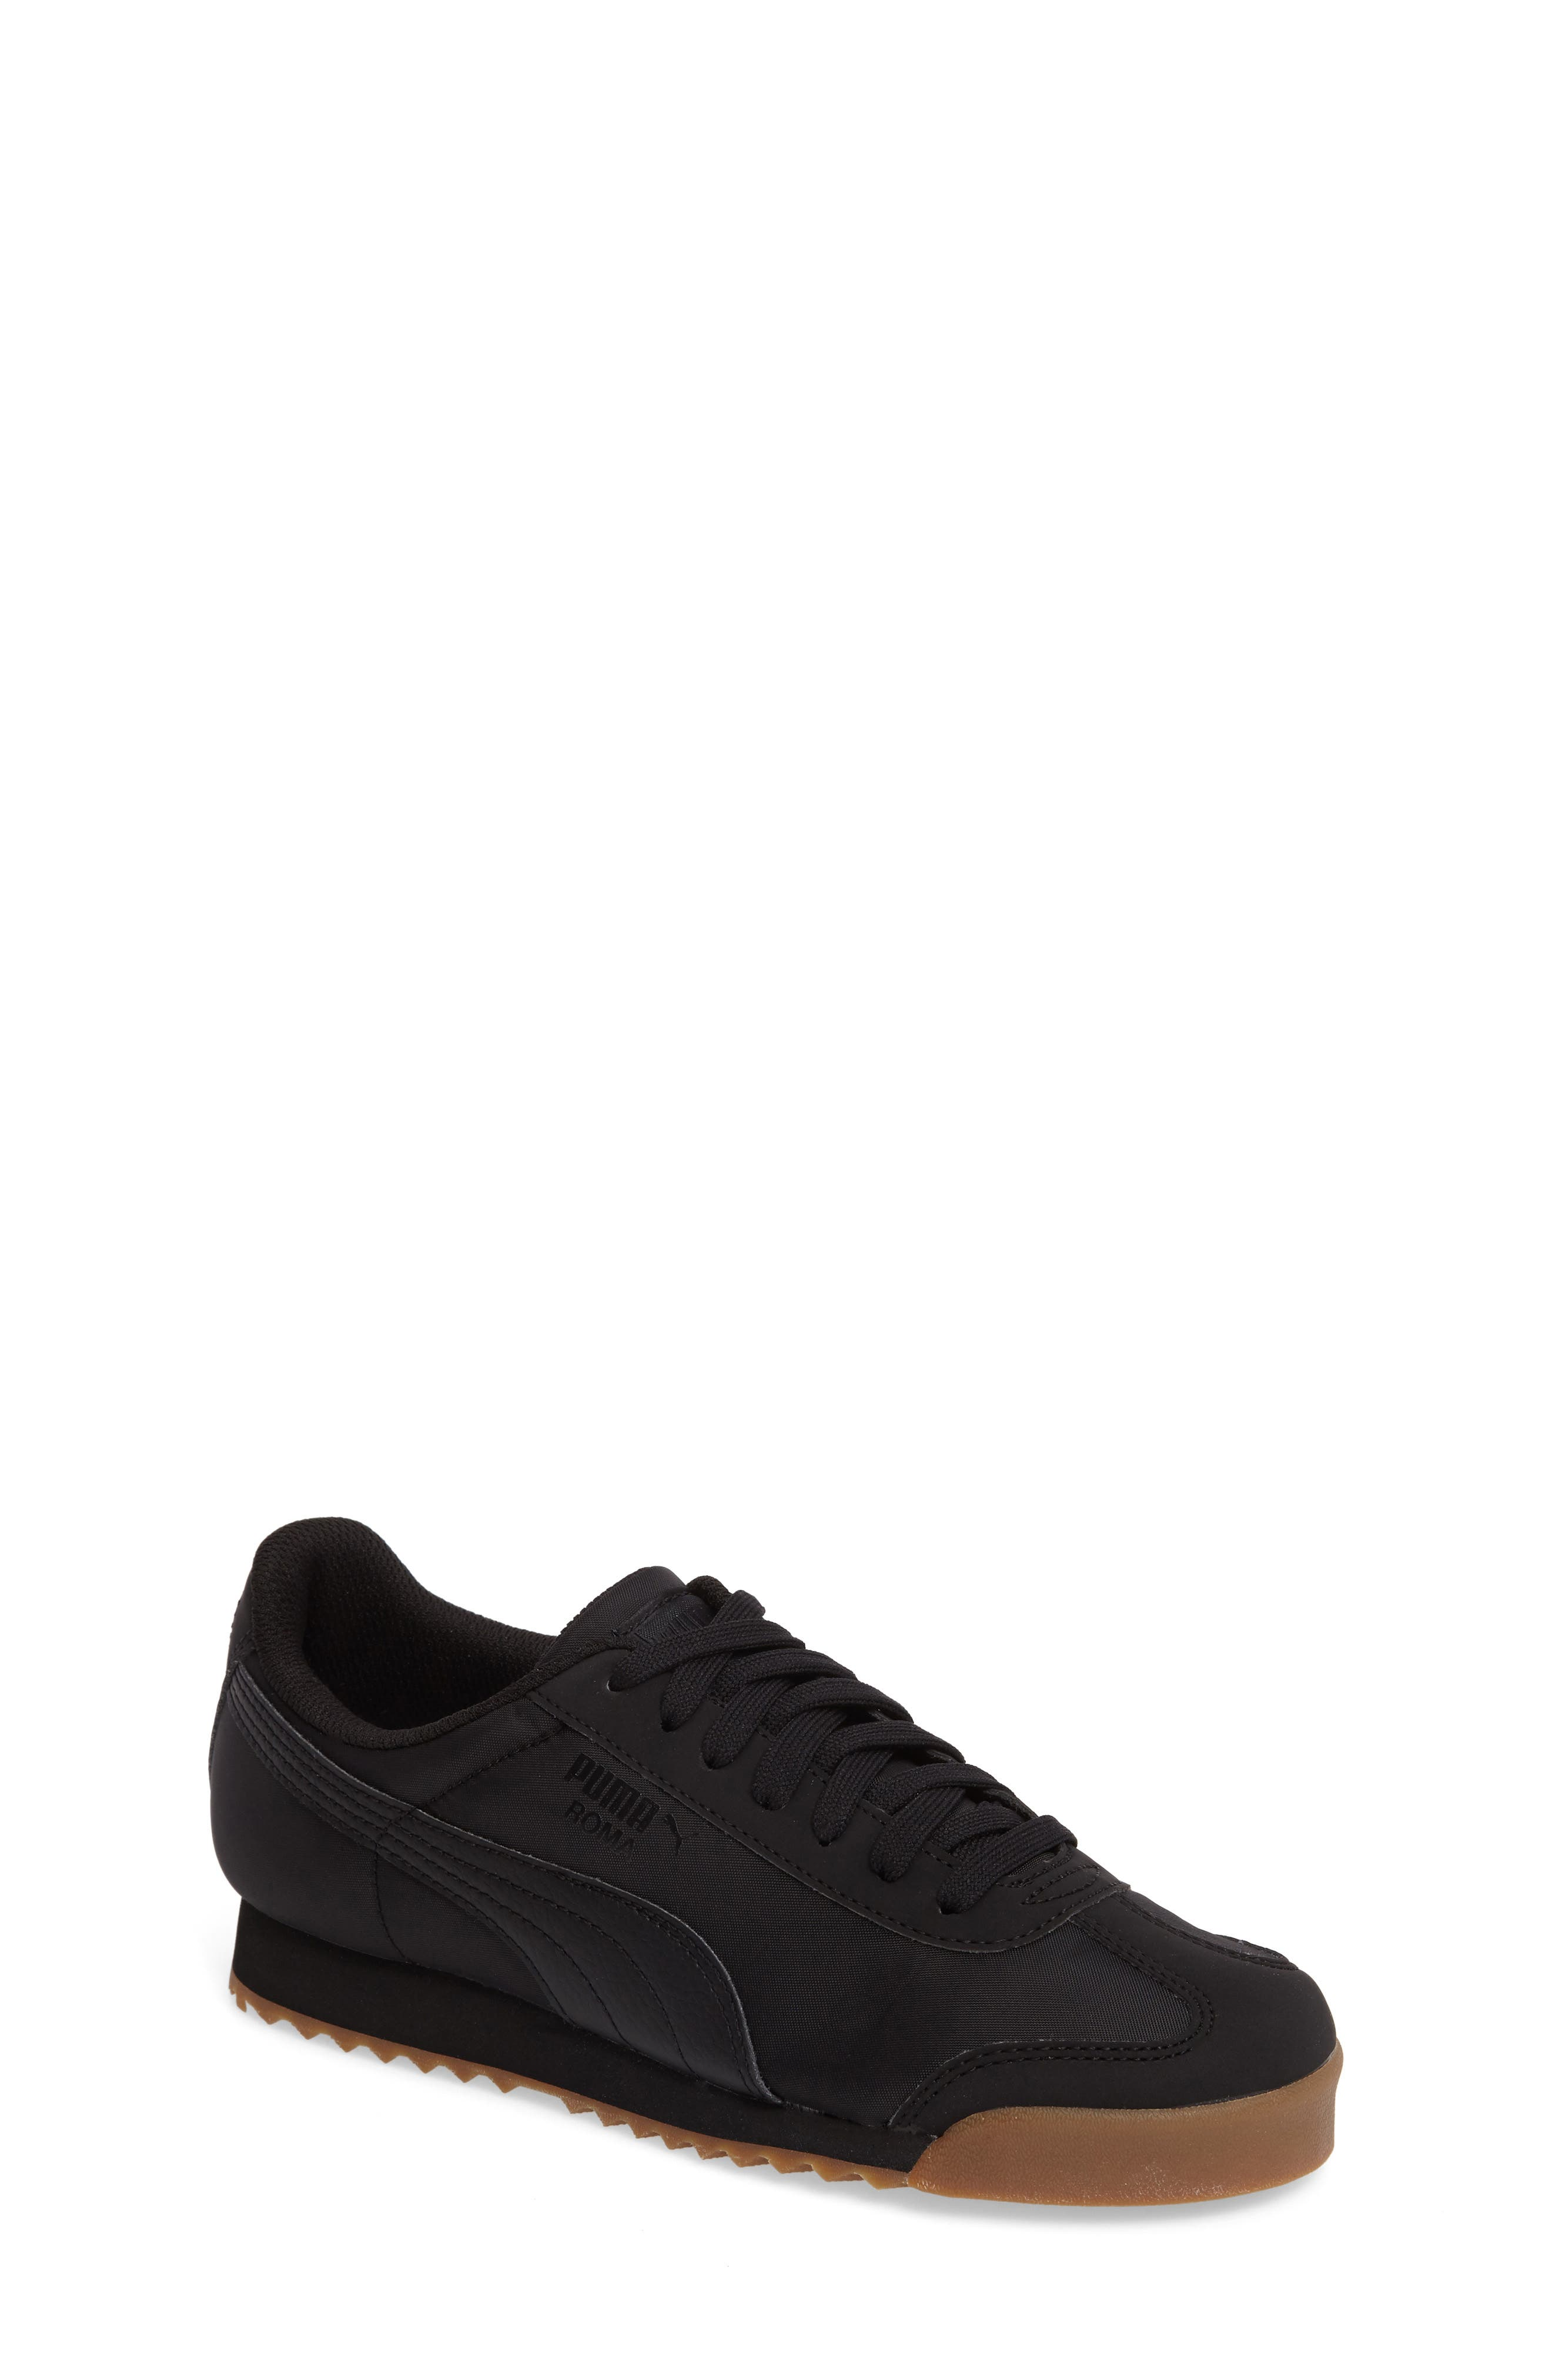 PUMA,                             Roma Basic Summer Sneaker,                             Main thumbnail 1, color,                             001